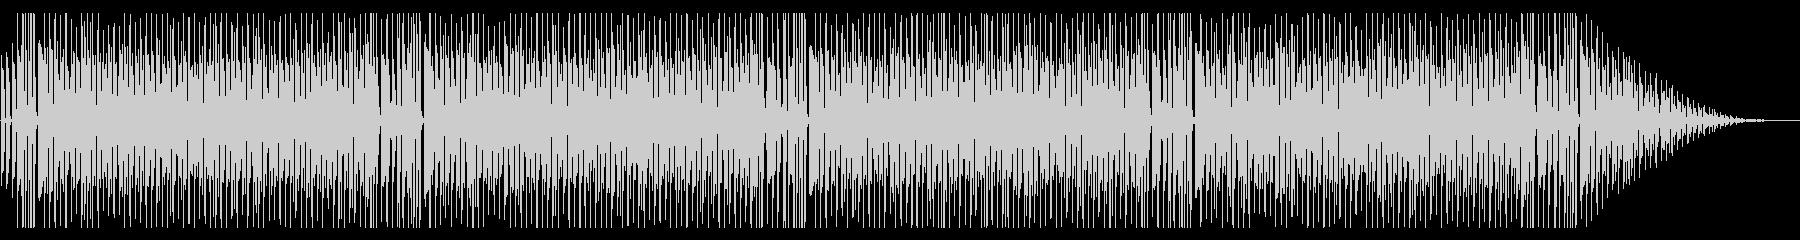 bgm35の未再生の波形